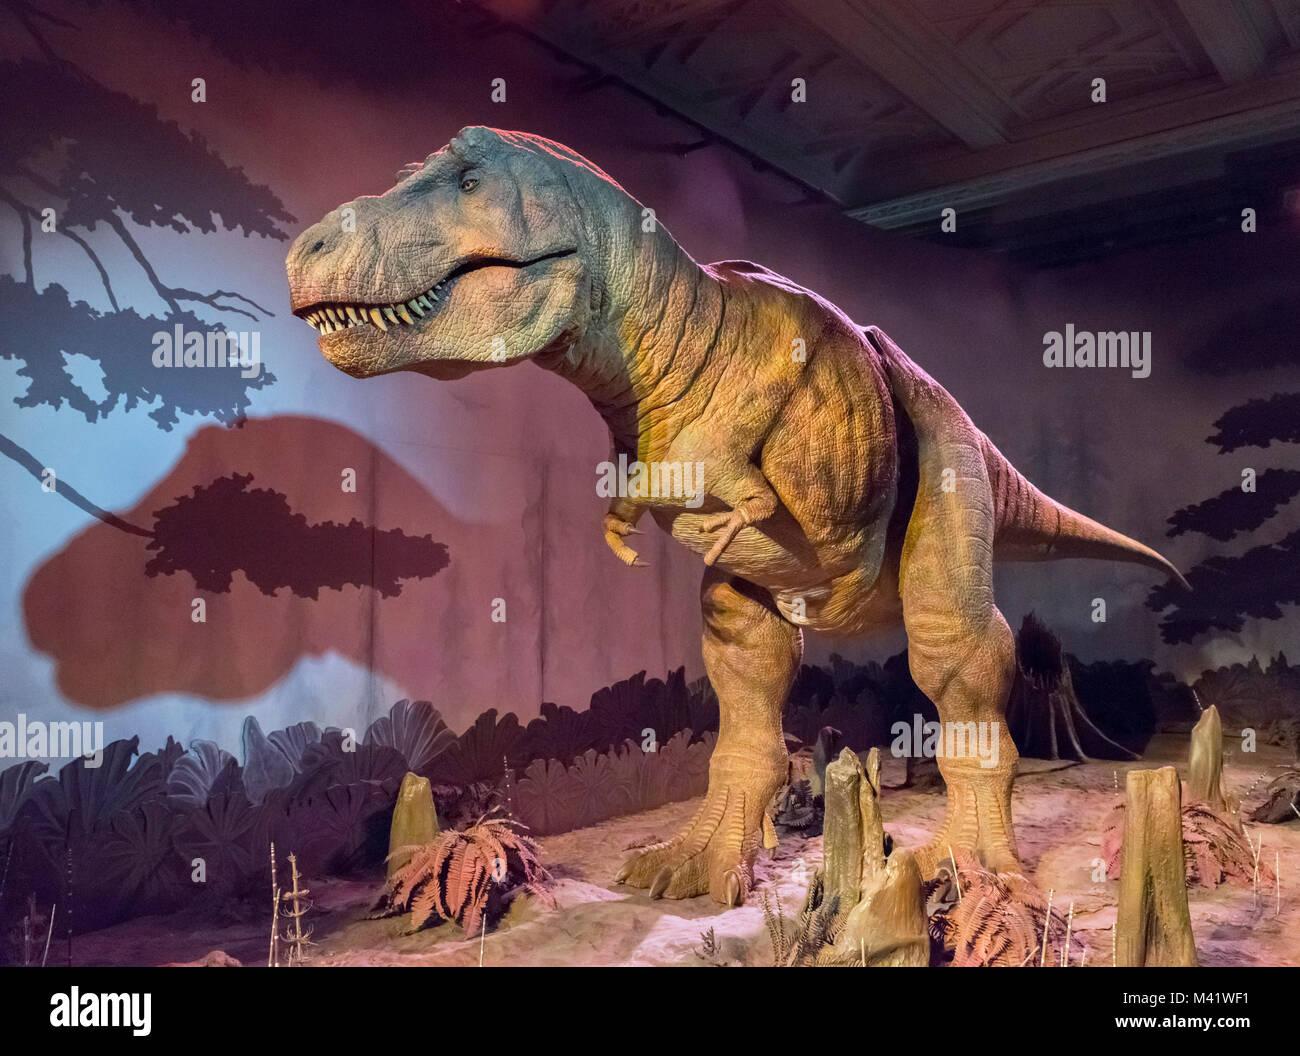 Tyrannosaurus rex. Animatronic T.Rex in the Dinosaurs Gallery, Natural History Museum, London. - Stock Image